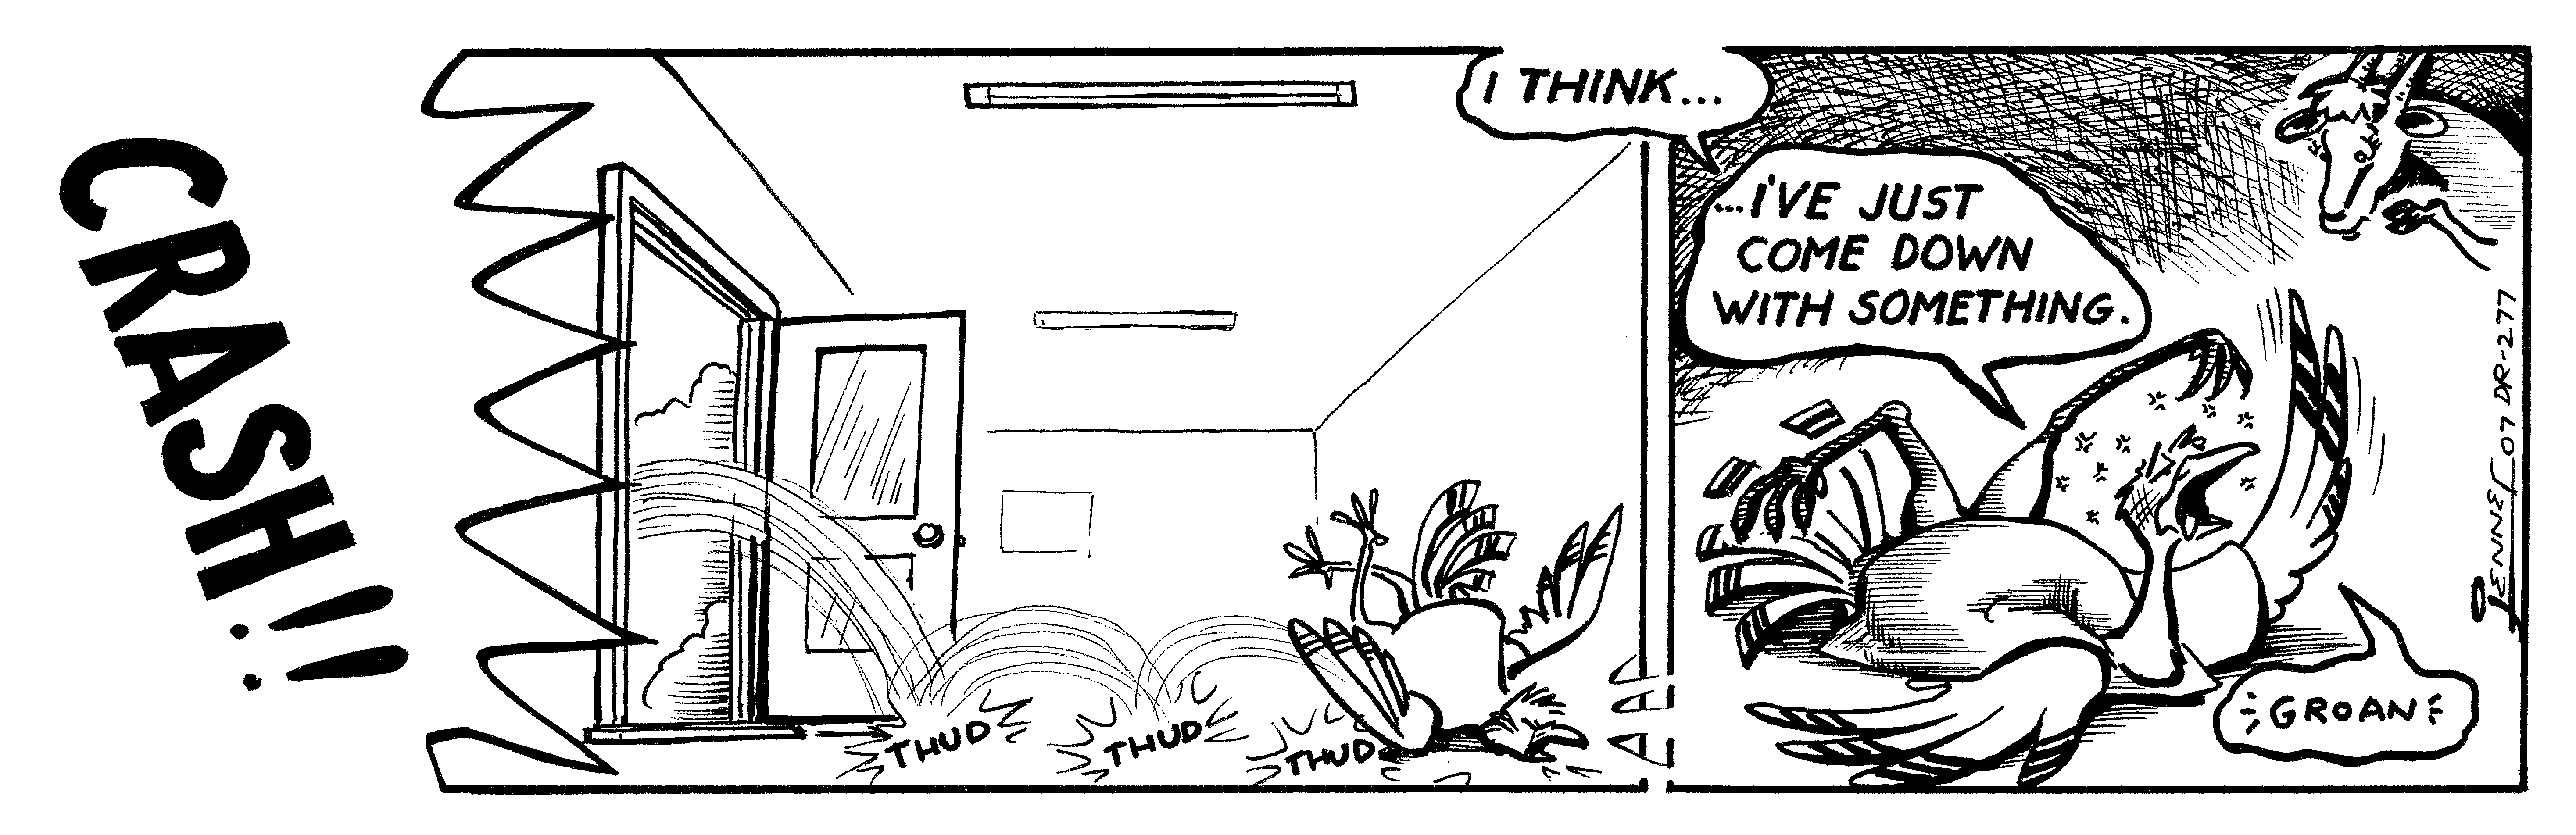 20070717